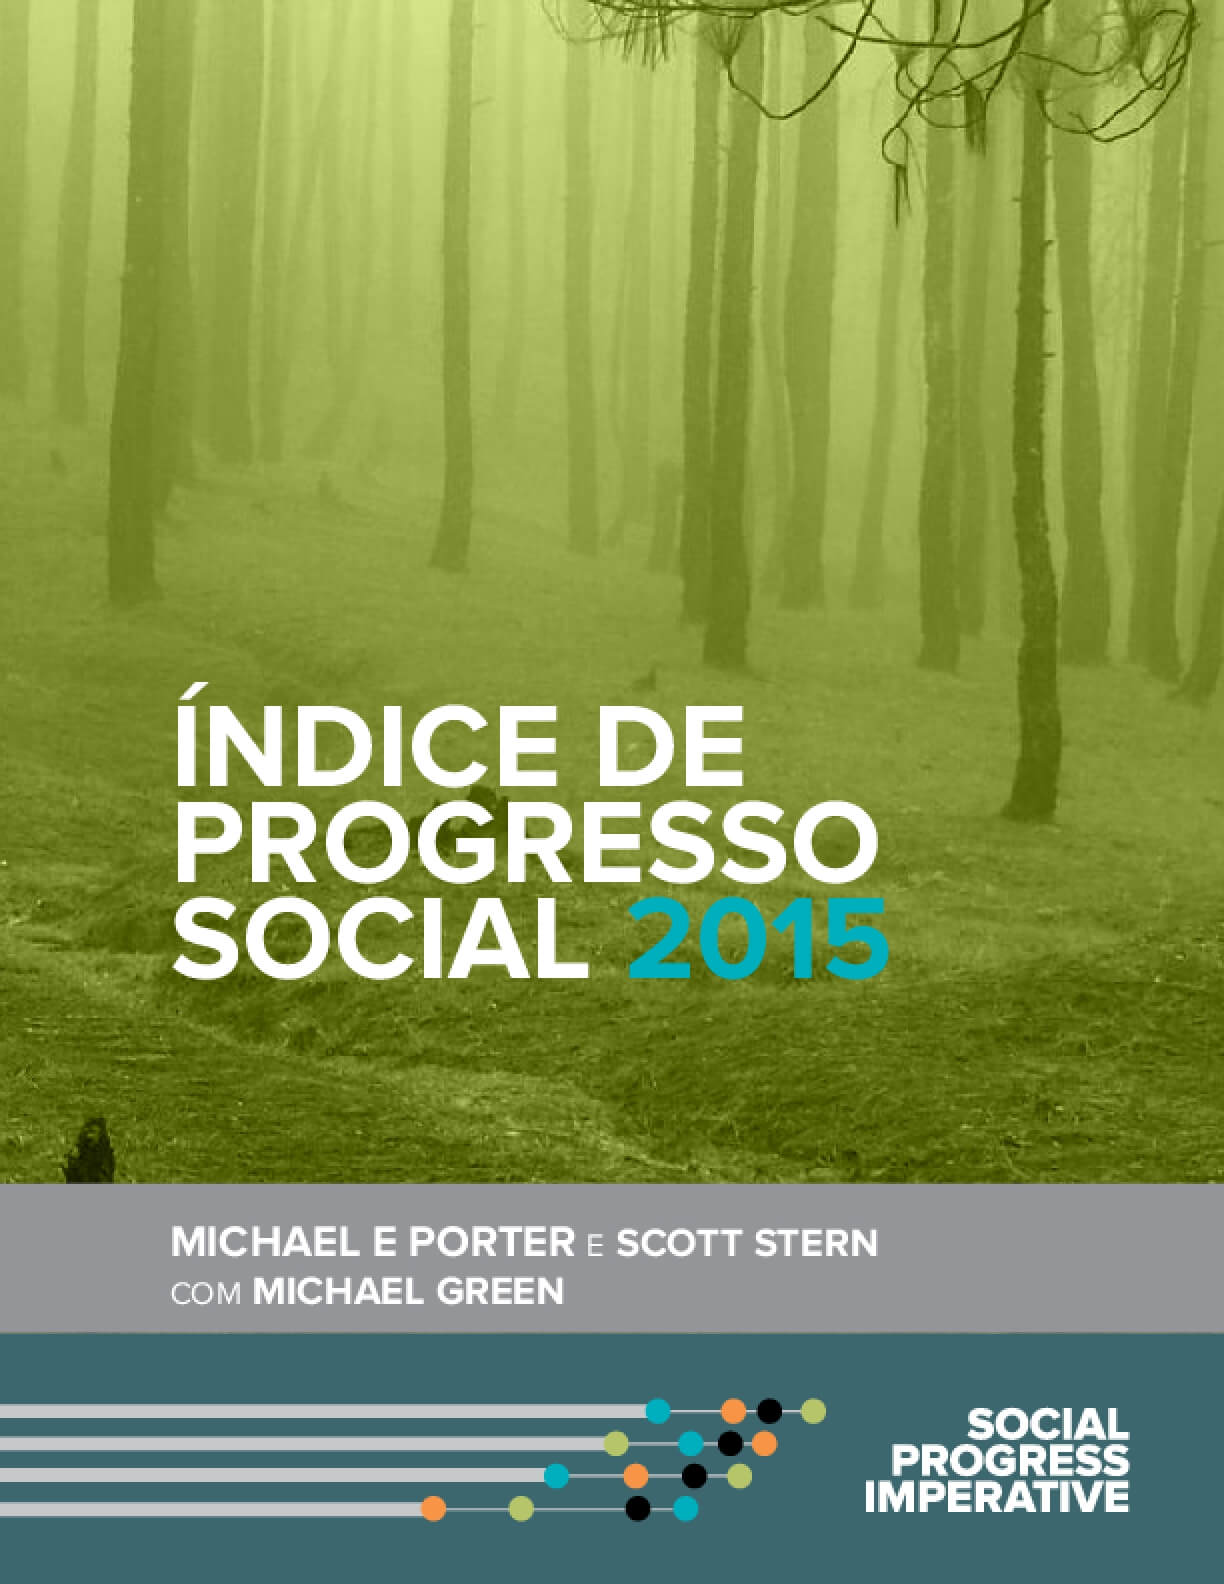 Índice de progresso social 2015